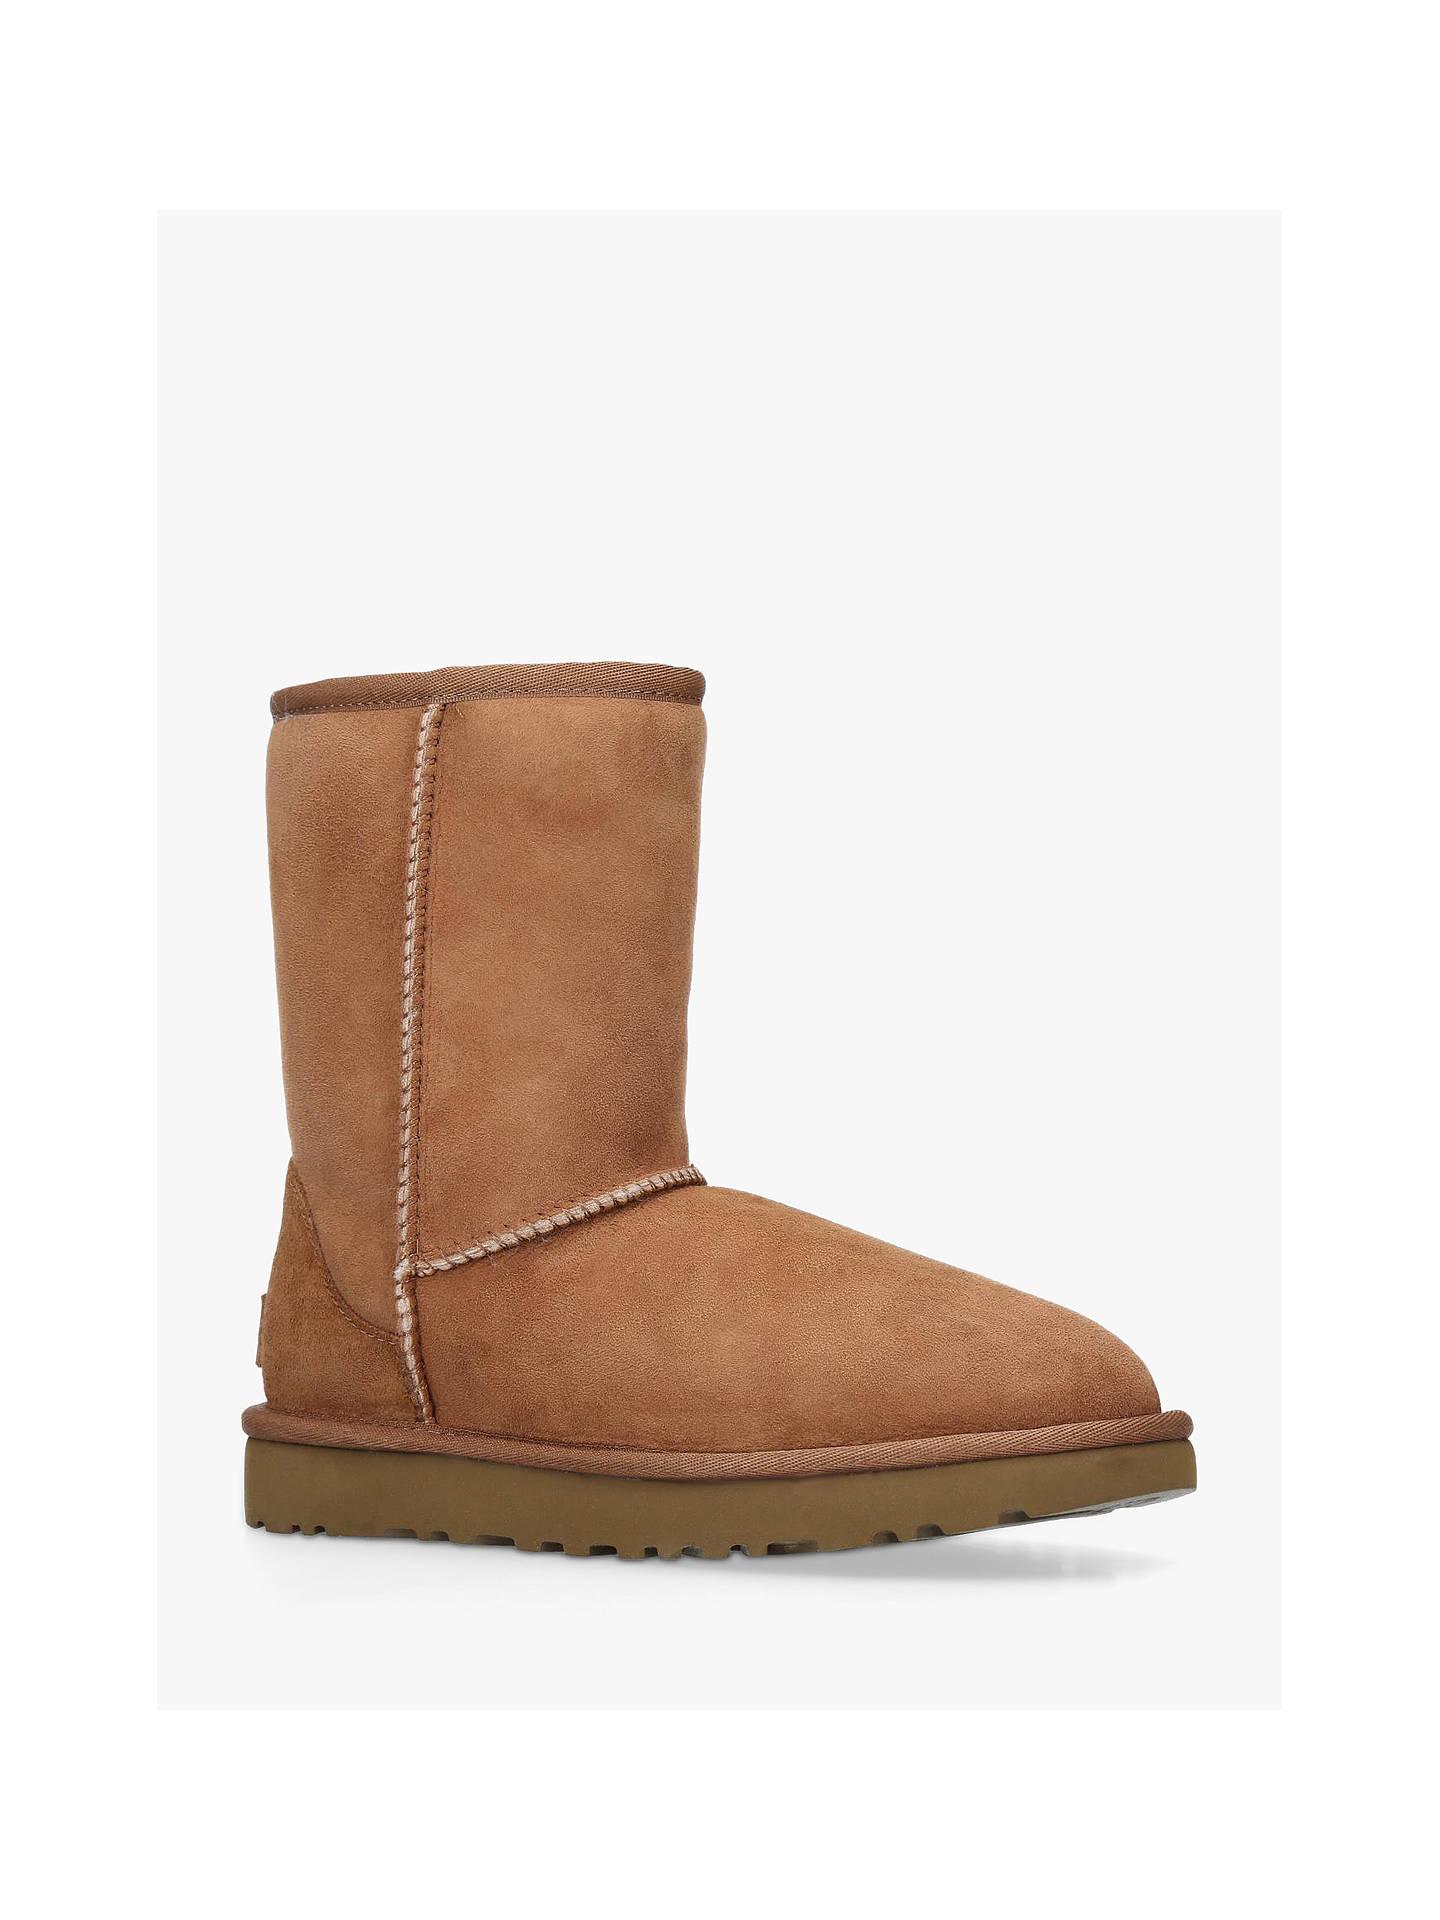 7d732097d2b UGG Classic II Short Sheepskin Ankle Boots, Chestnut